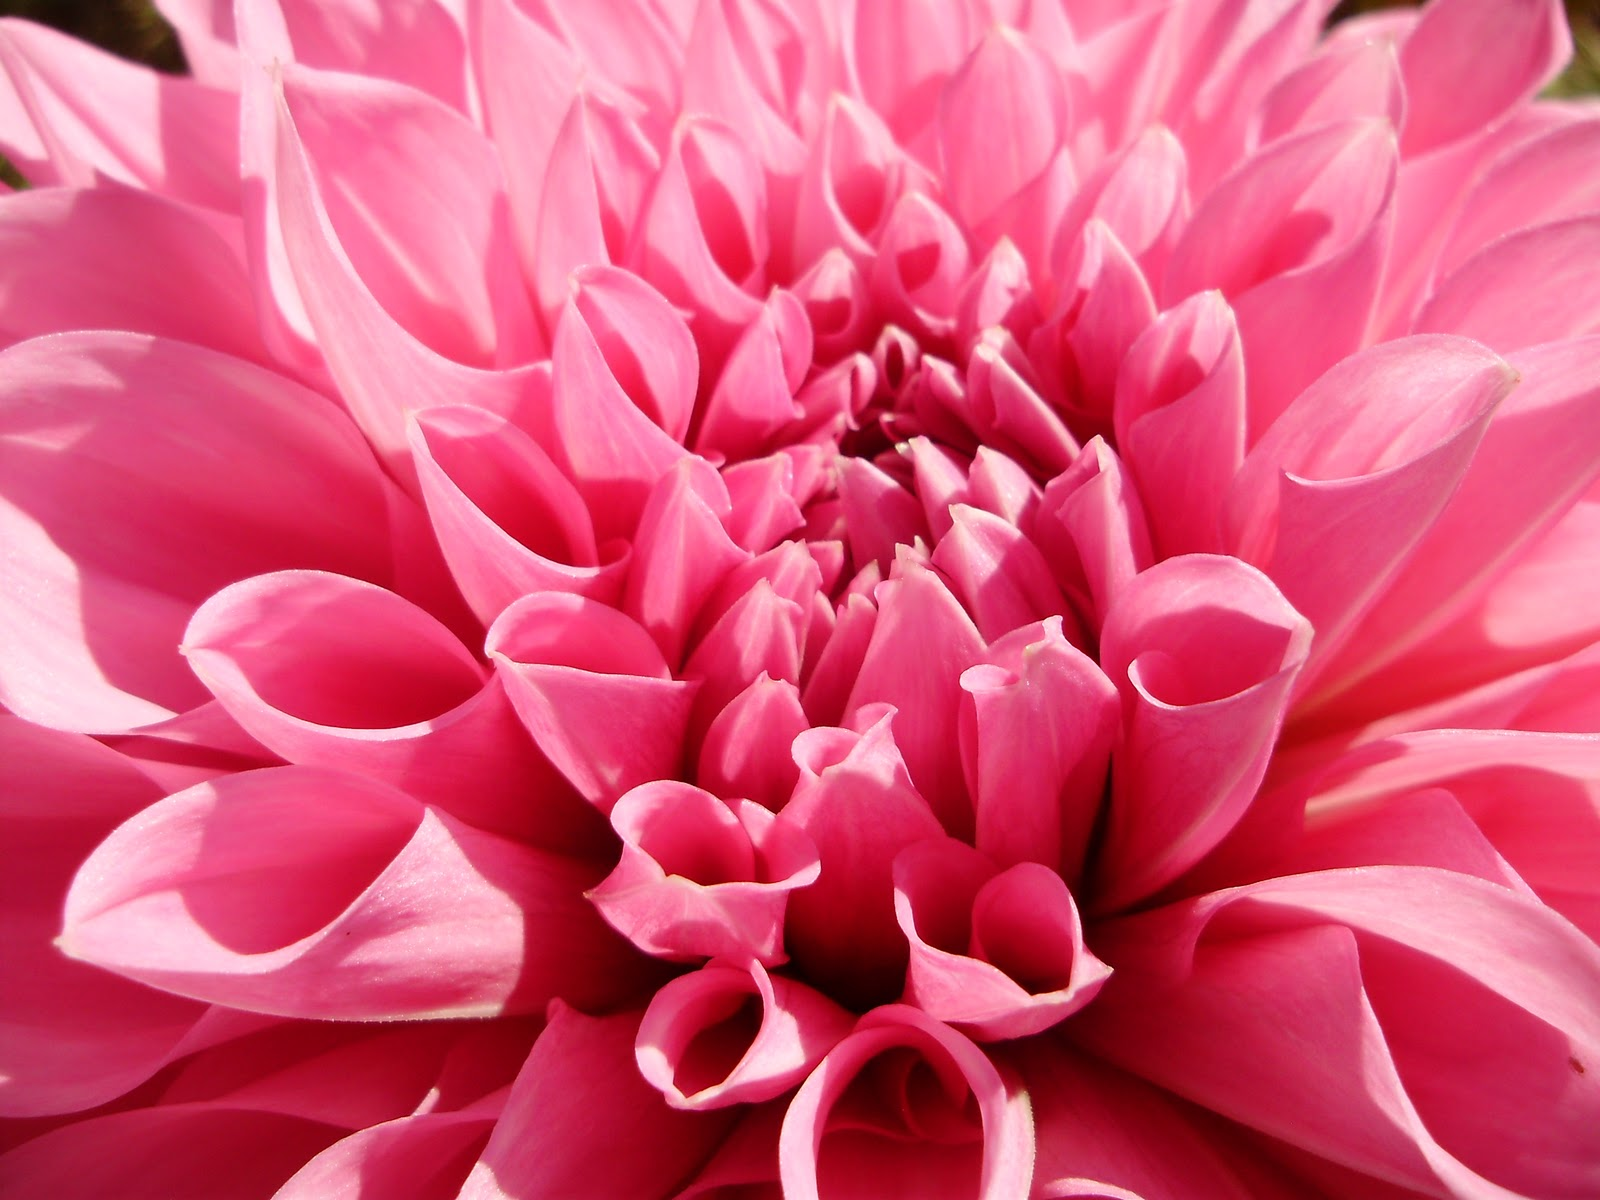 Pink Dahlia Spring Flower Wallpaper   Pink Dahlia Spring Flower 1600x1200